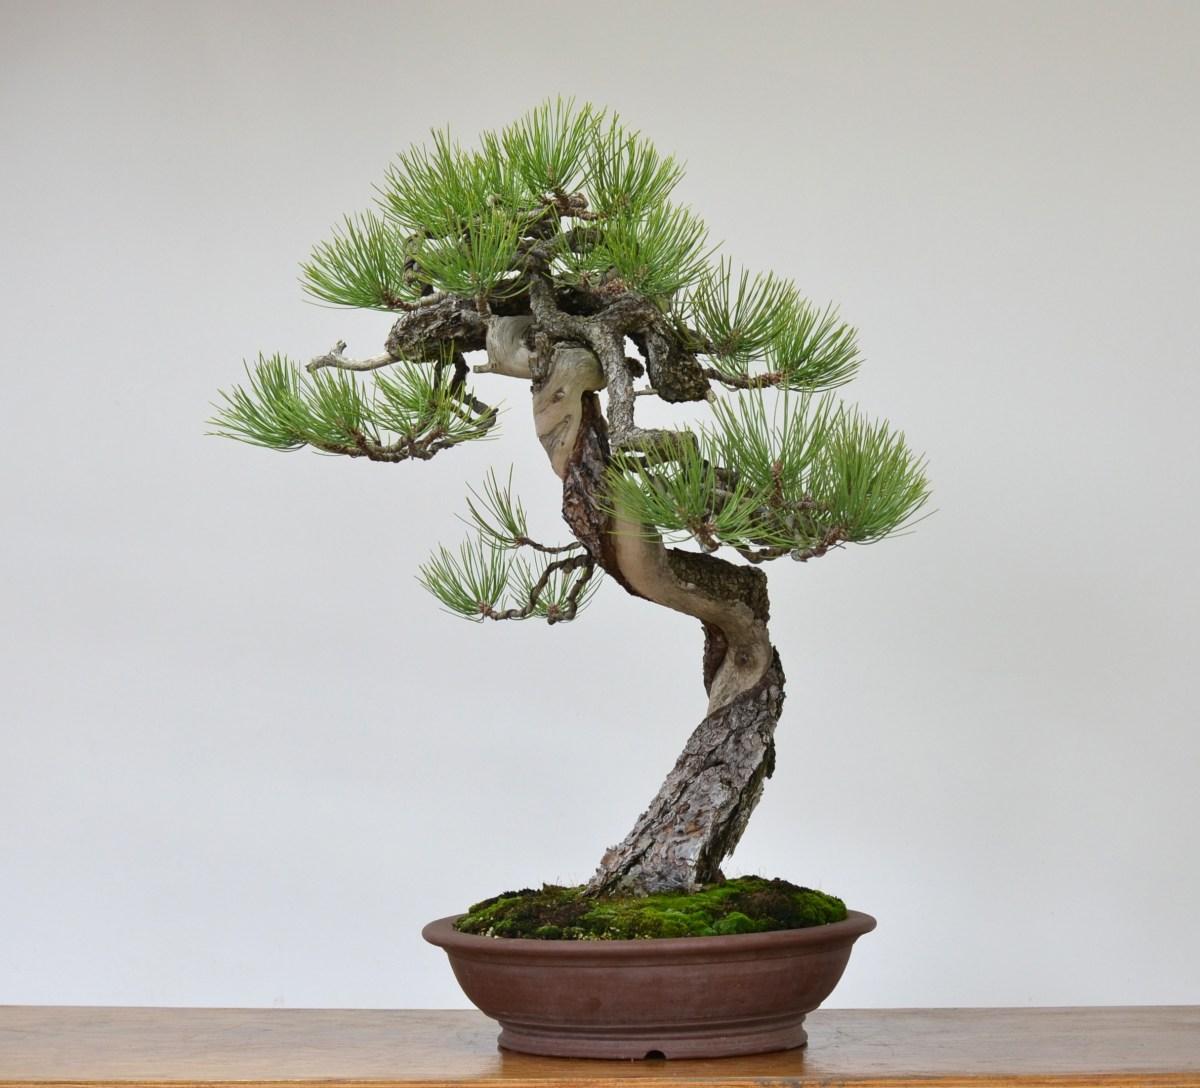 Wiring White Pine Bonsai